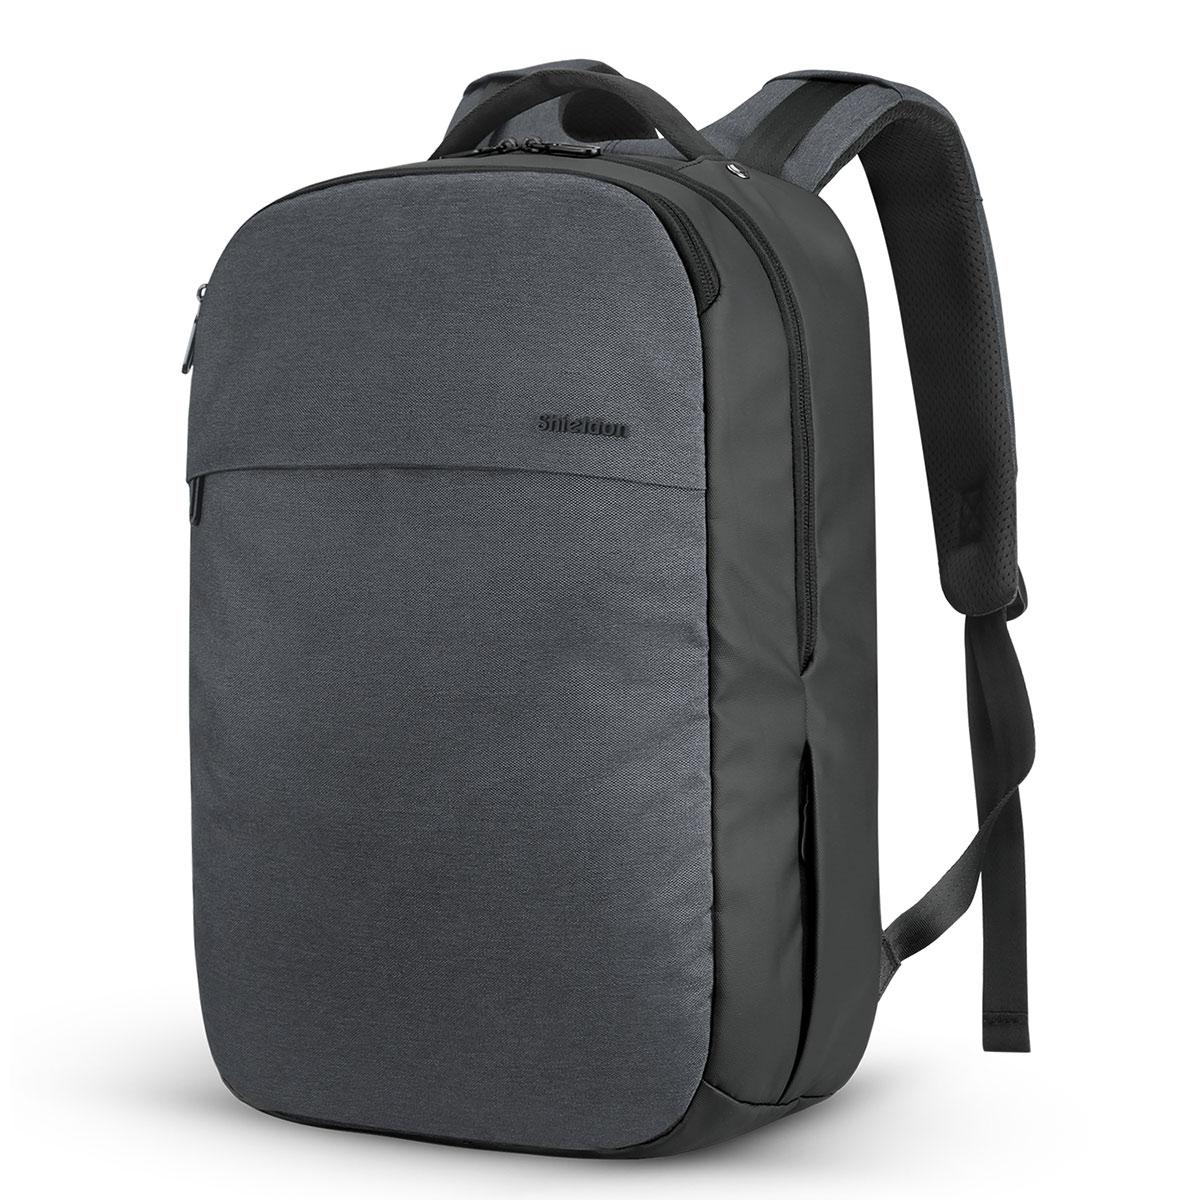 SHIELDON Travel Laptop Backpack 15.6-inch for Men &Women